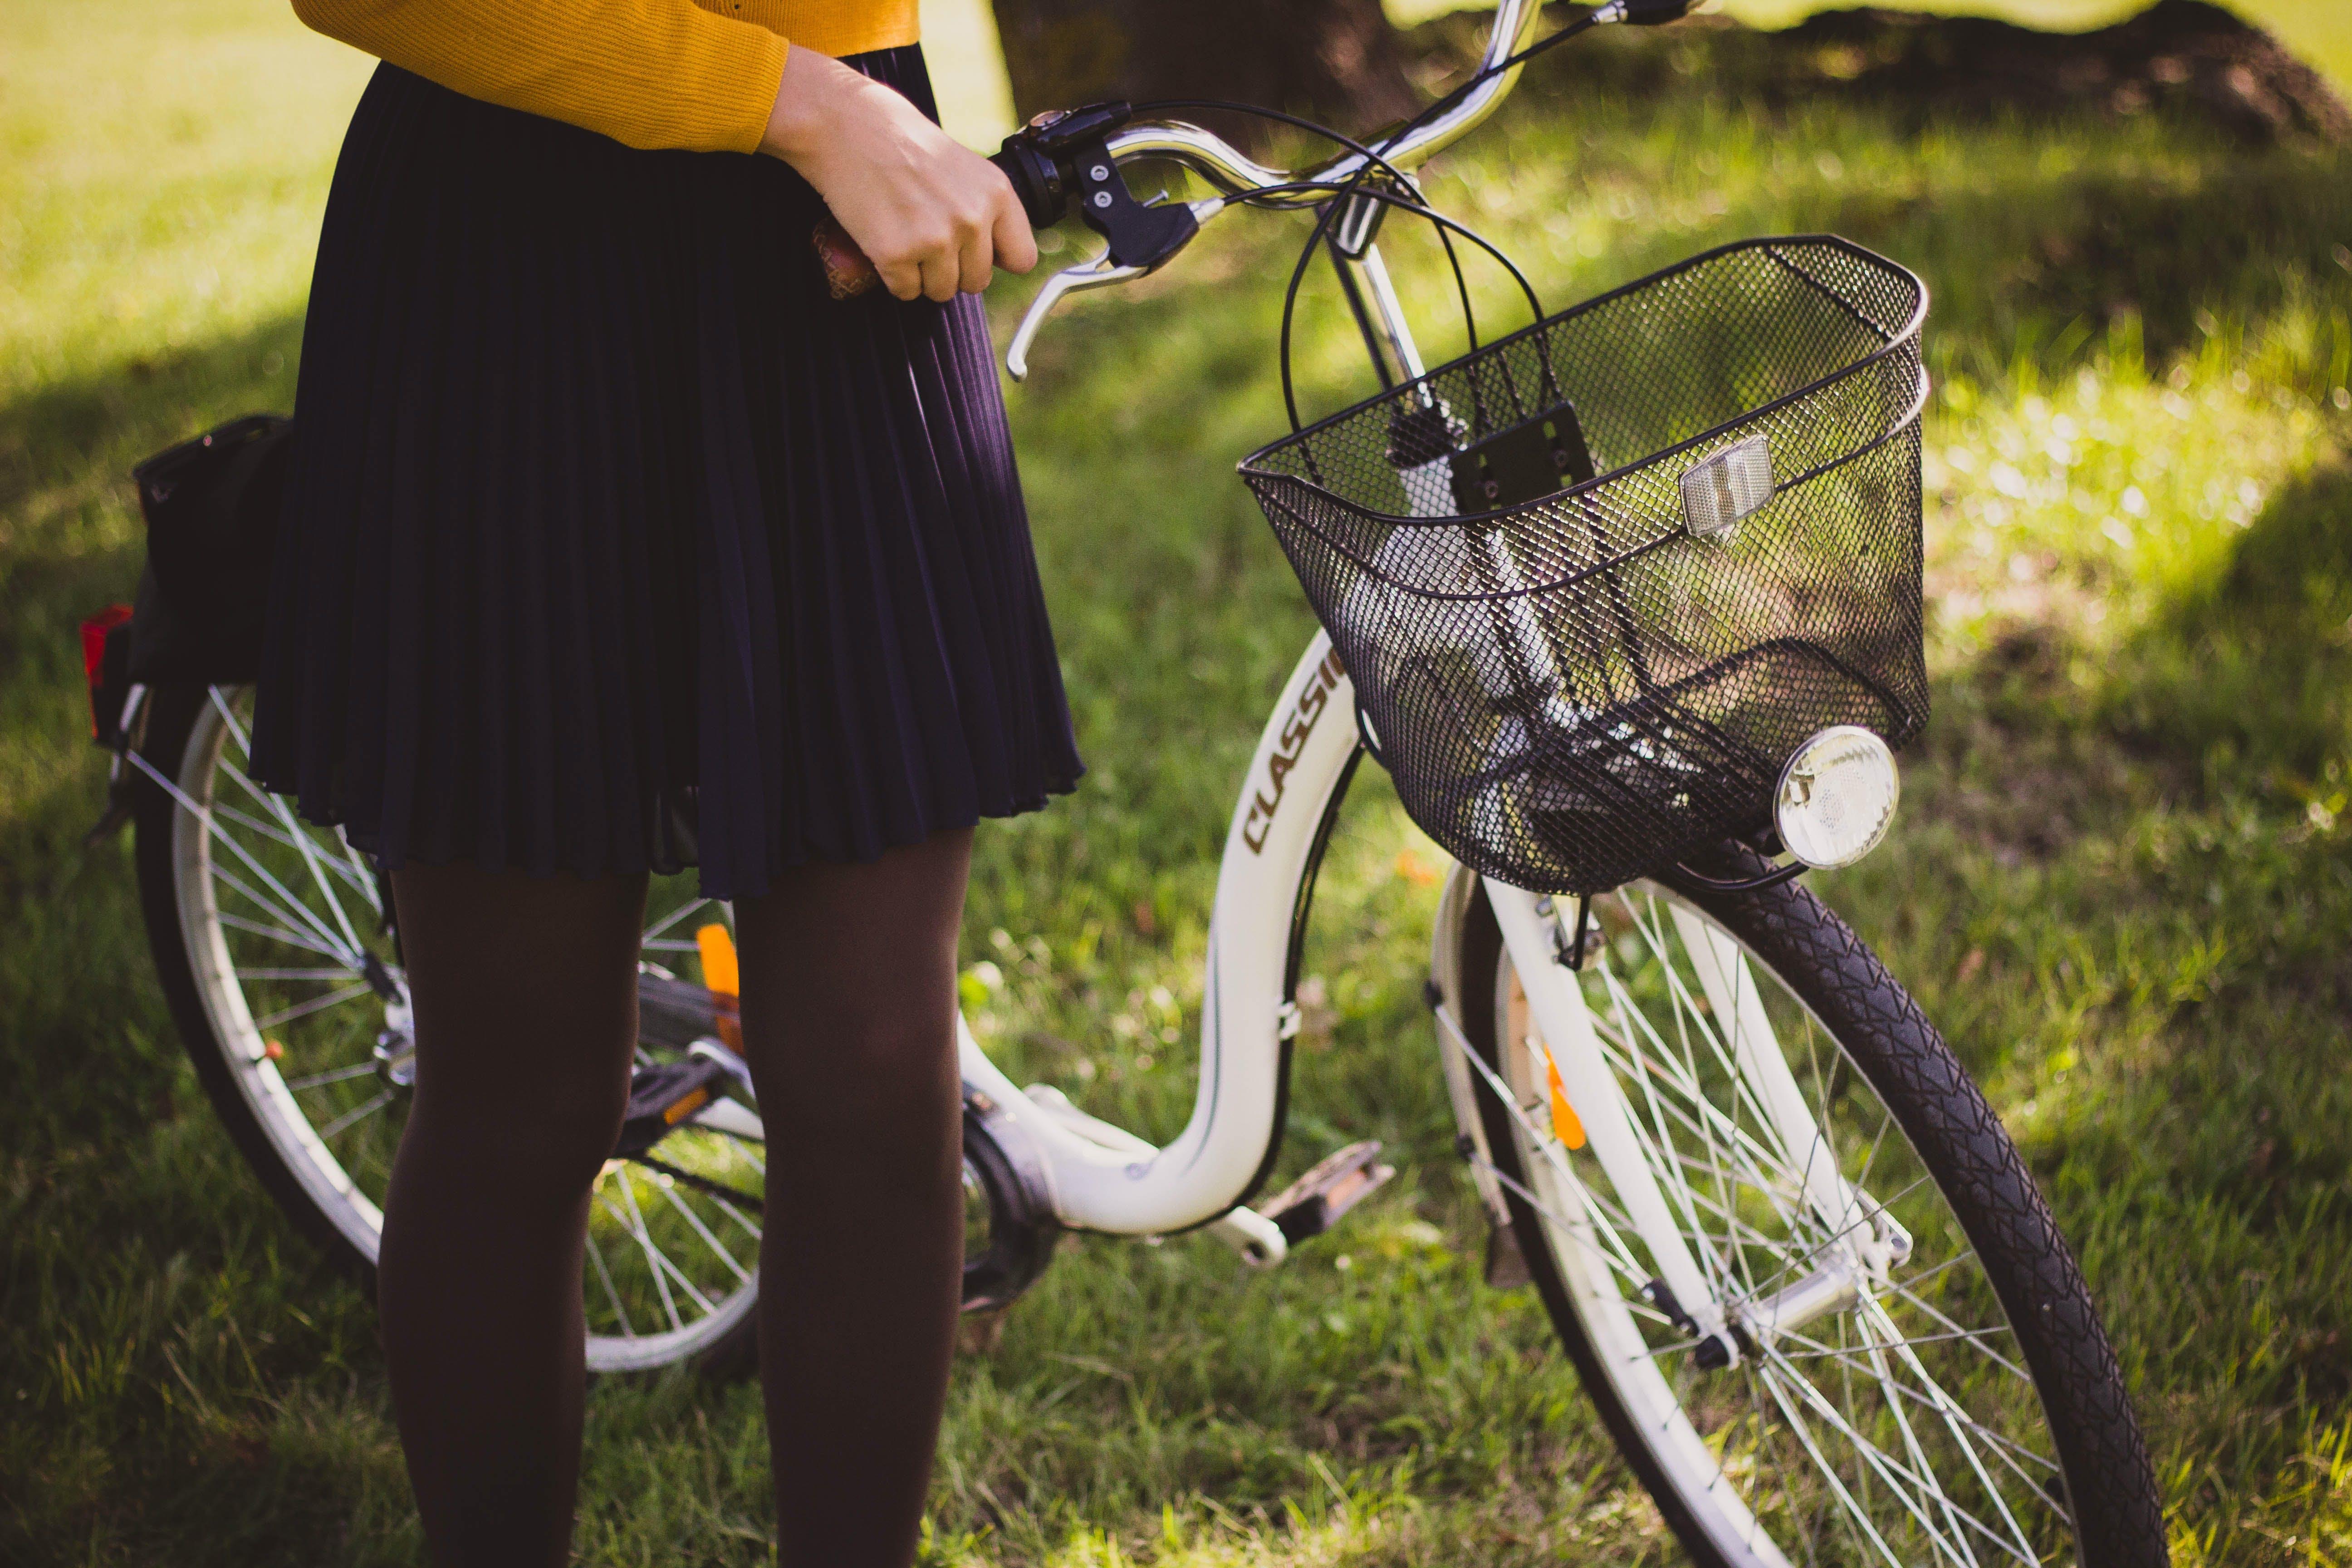 Kostenloses Stock Foto zu draußen, fahrrad, faltenrock, frau